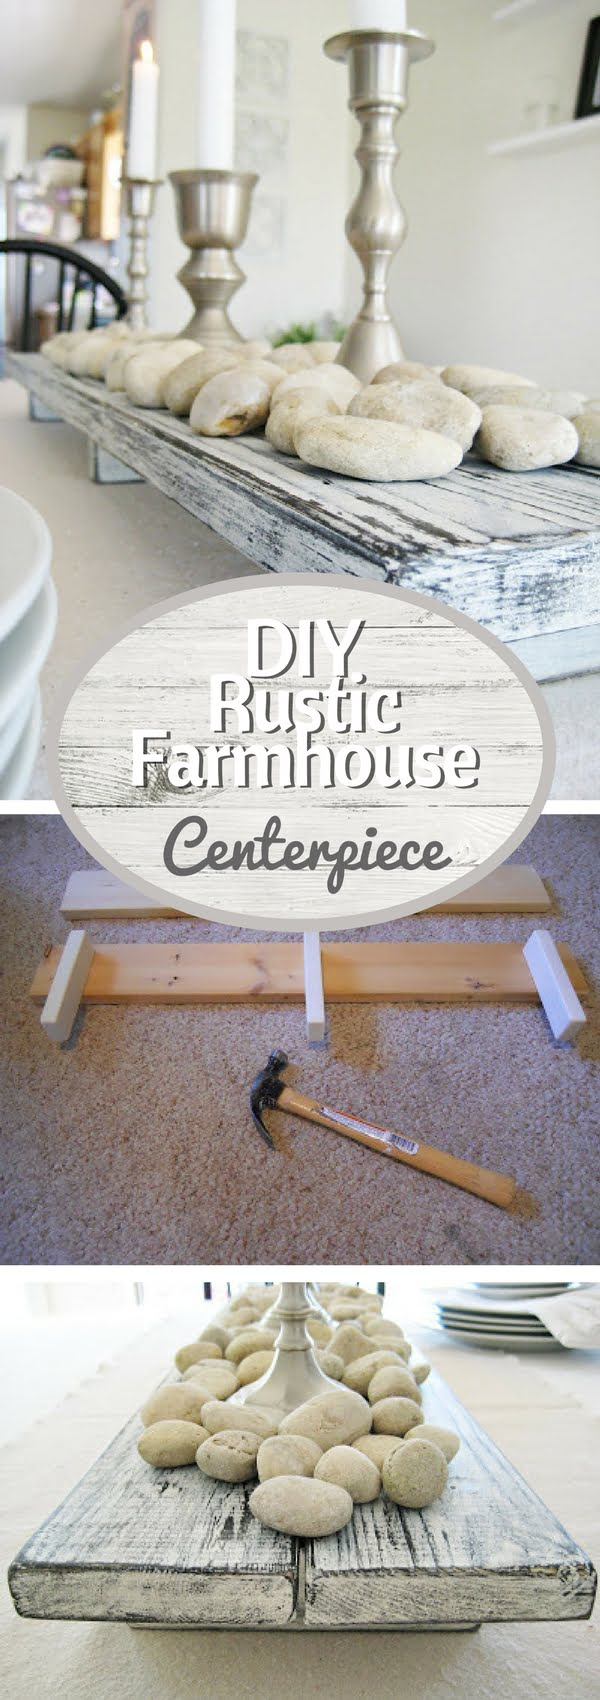 How to build an easy DIY rustic farmhouse centerpiece